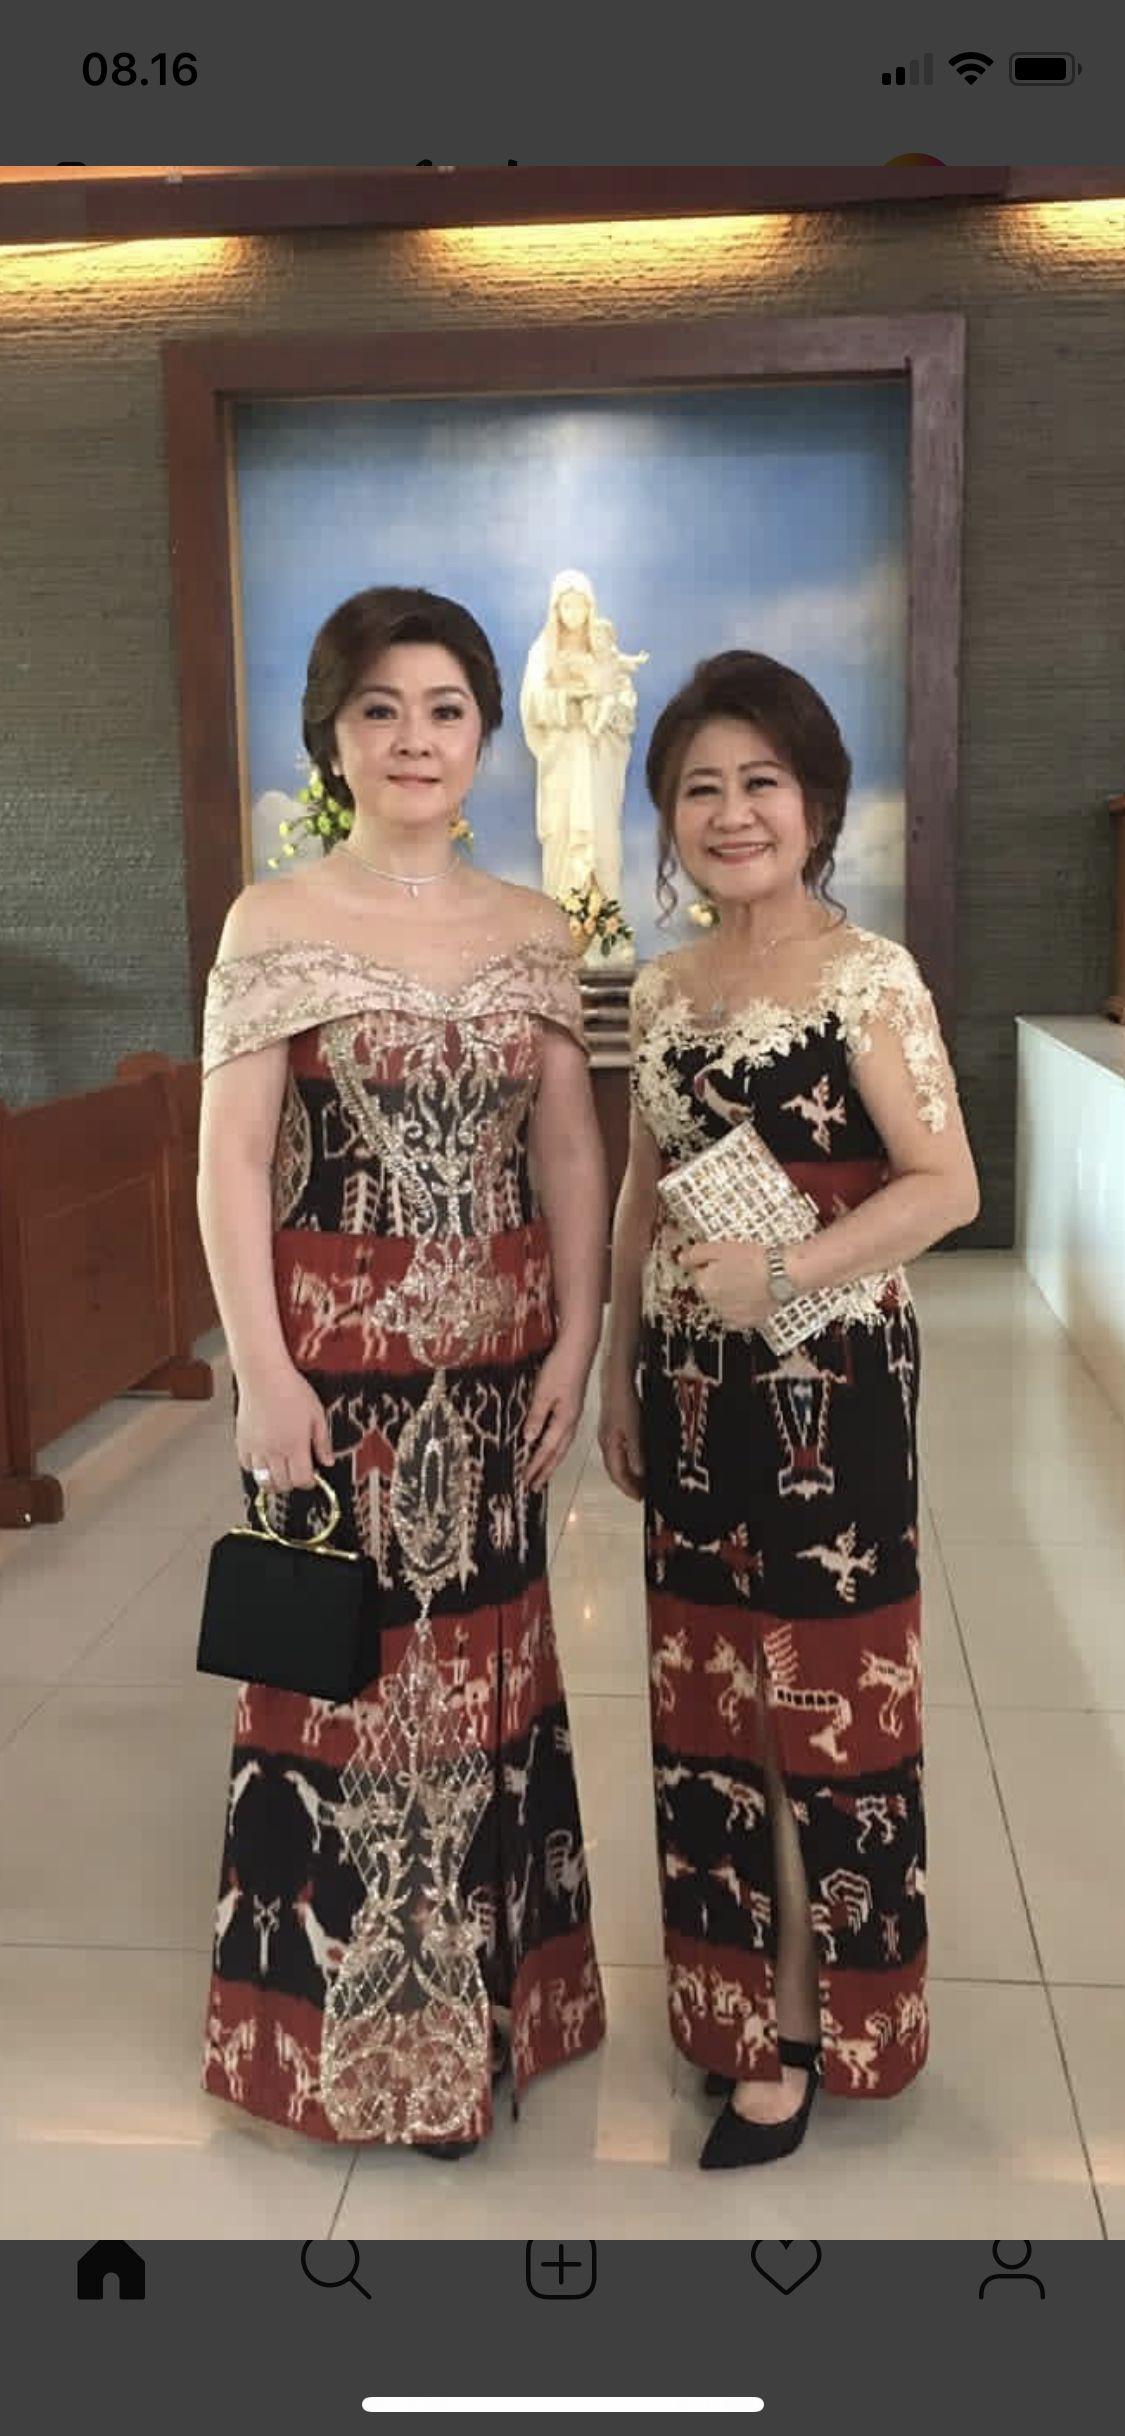 Baju Dress Pakaian Di 2019 Gaun Renda Gaya Busana Dan Gaun Malam